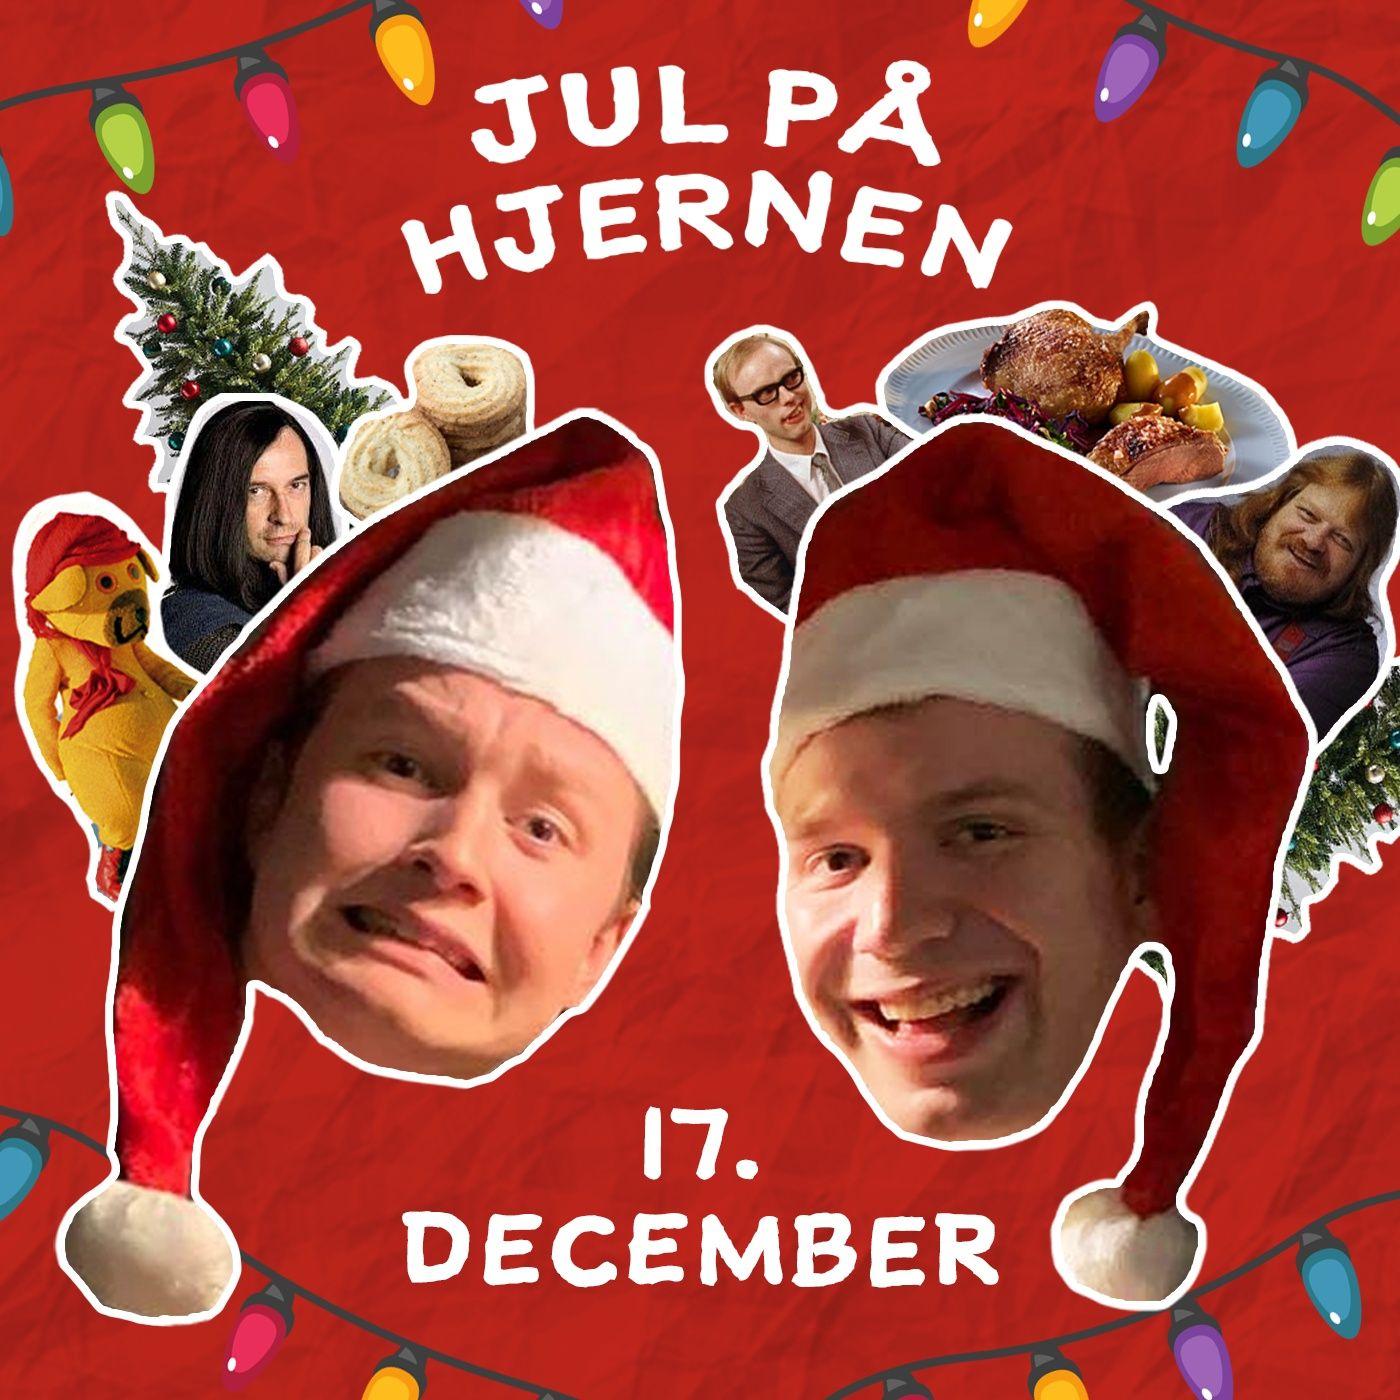 17 December - Jul på hjernen